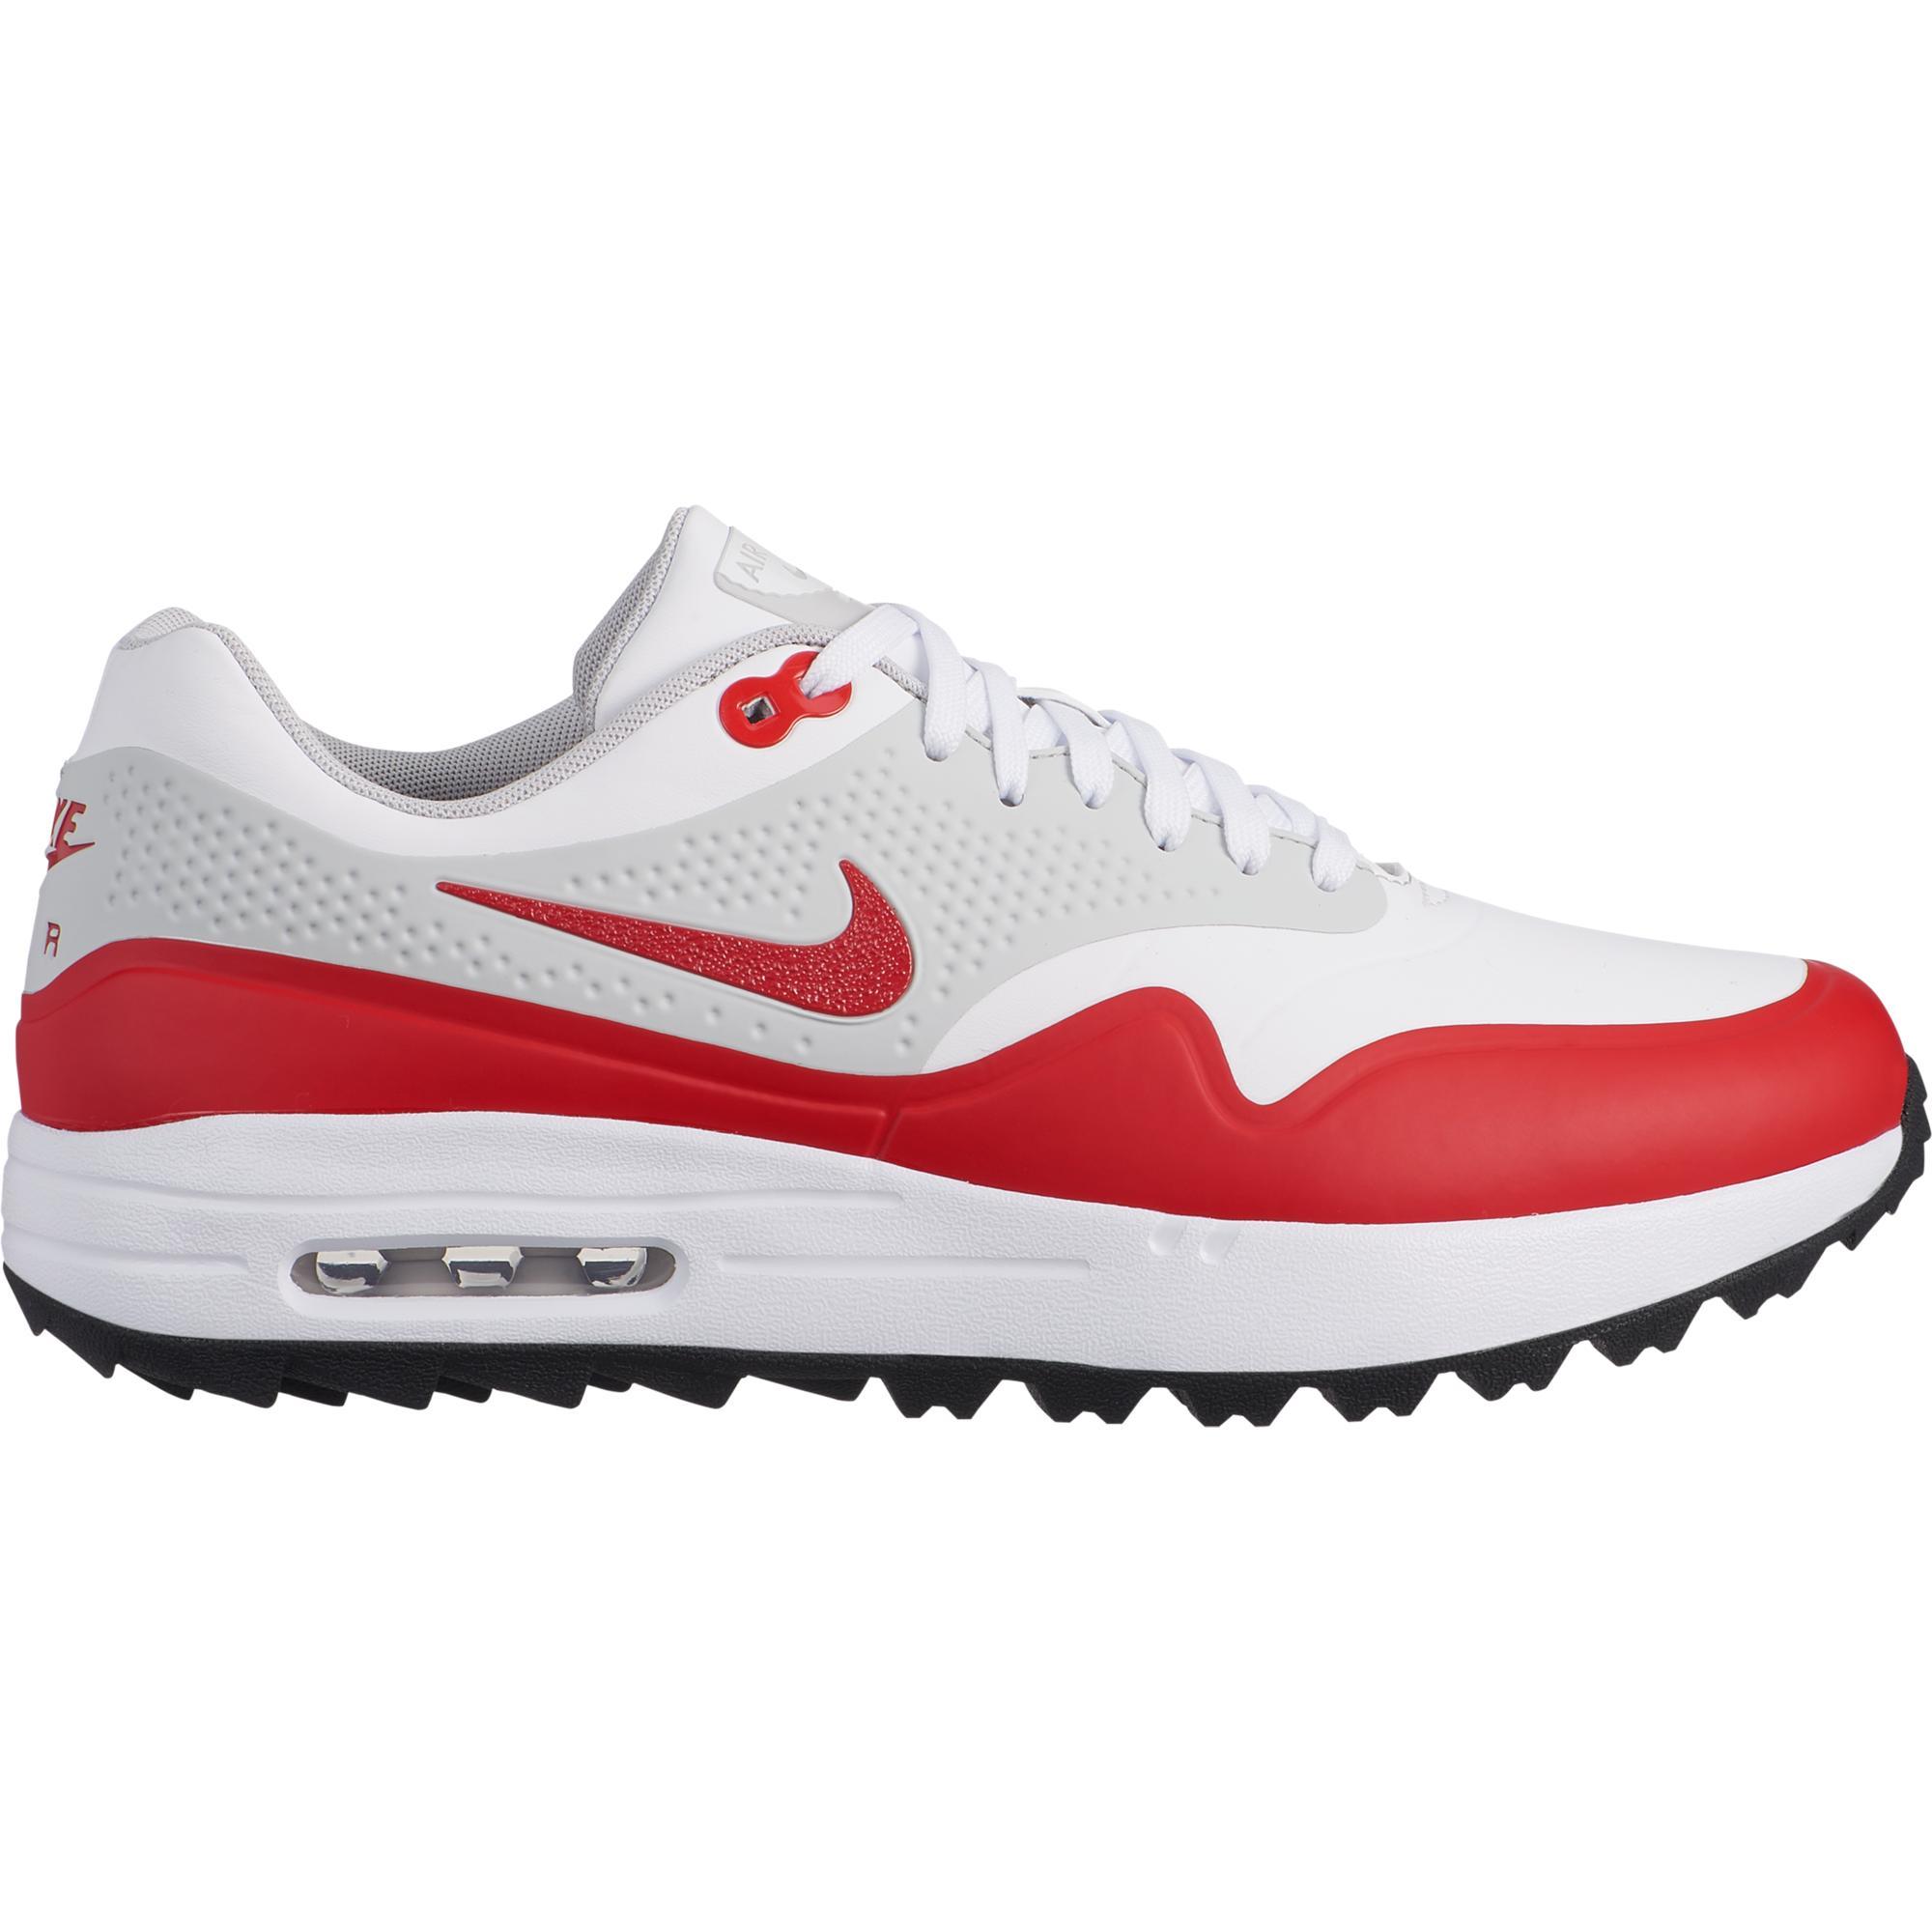 Men's Air Max 1 OG Spikeless Golf Shoe - WHITE/RED